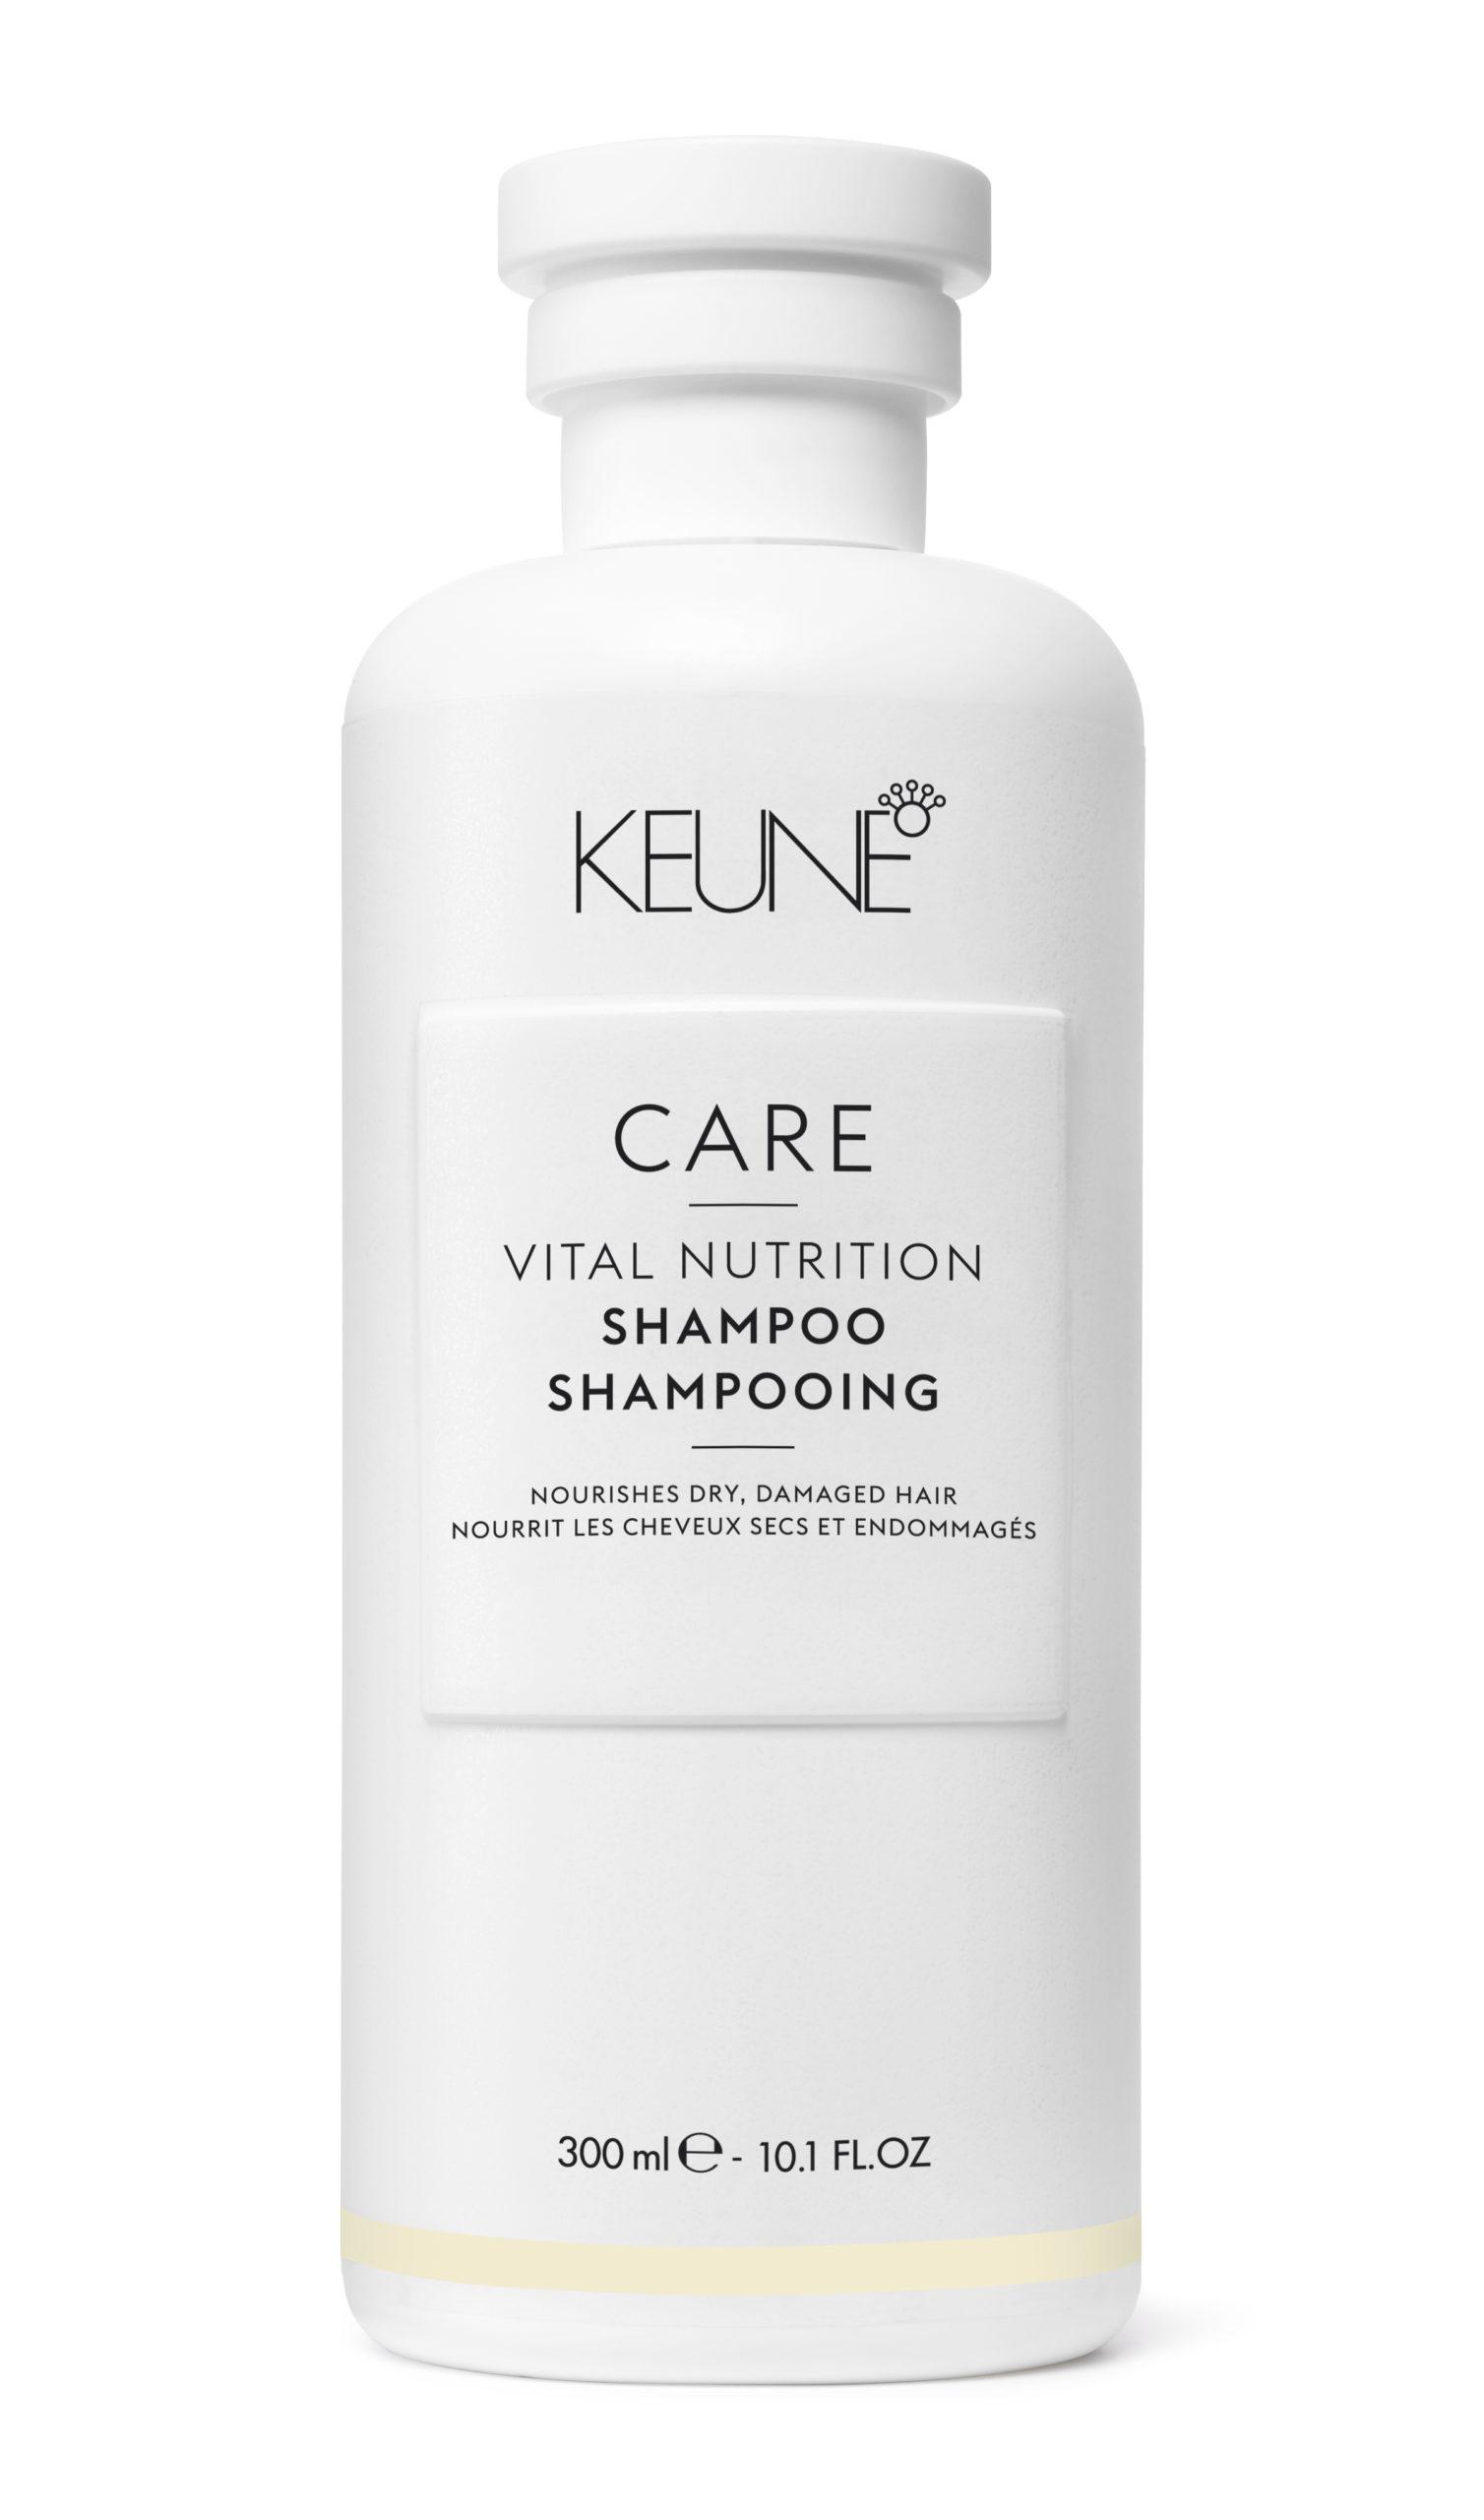 Care-Vital-Nutrition-Shampoo-300ml-highres